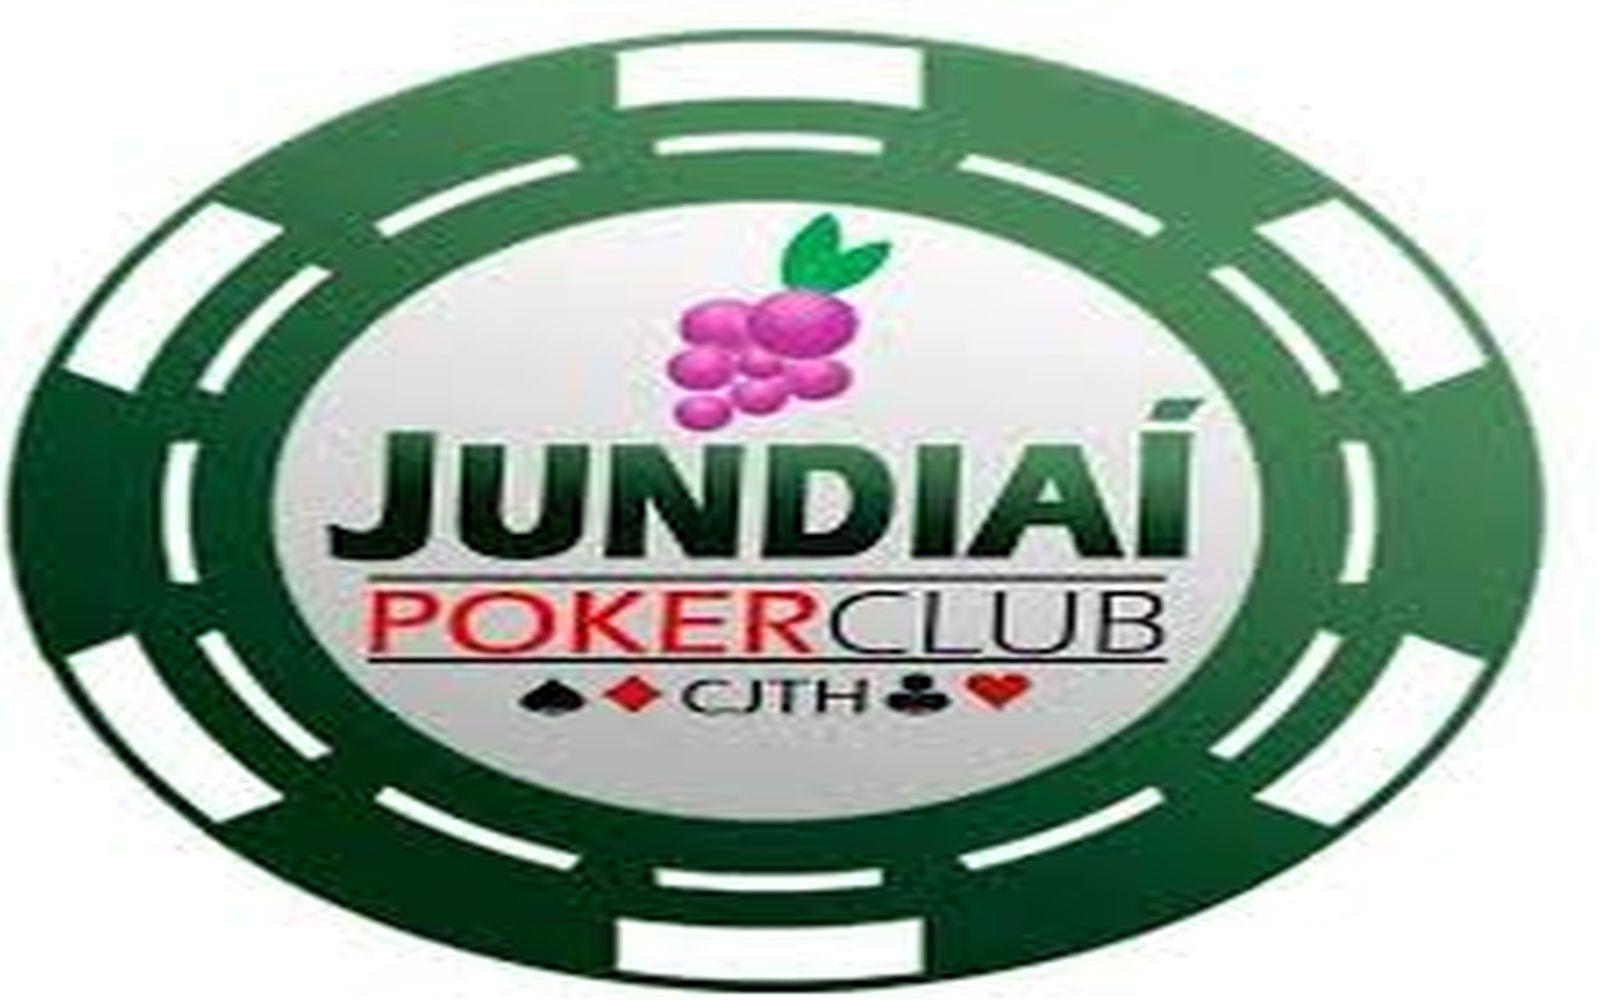 Jundiai Poker Club